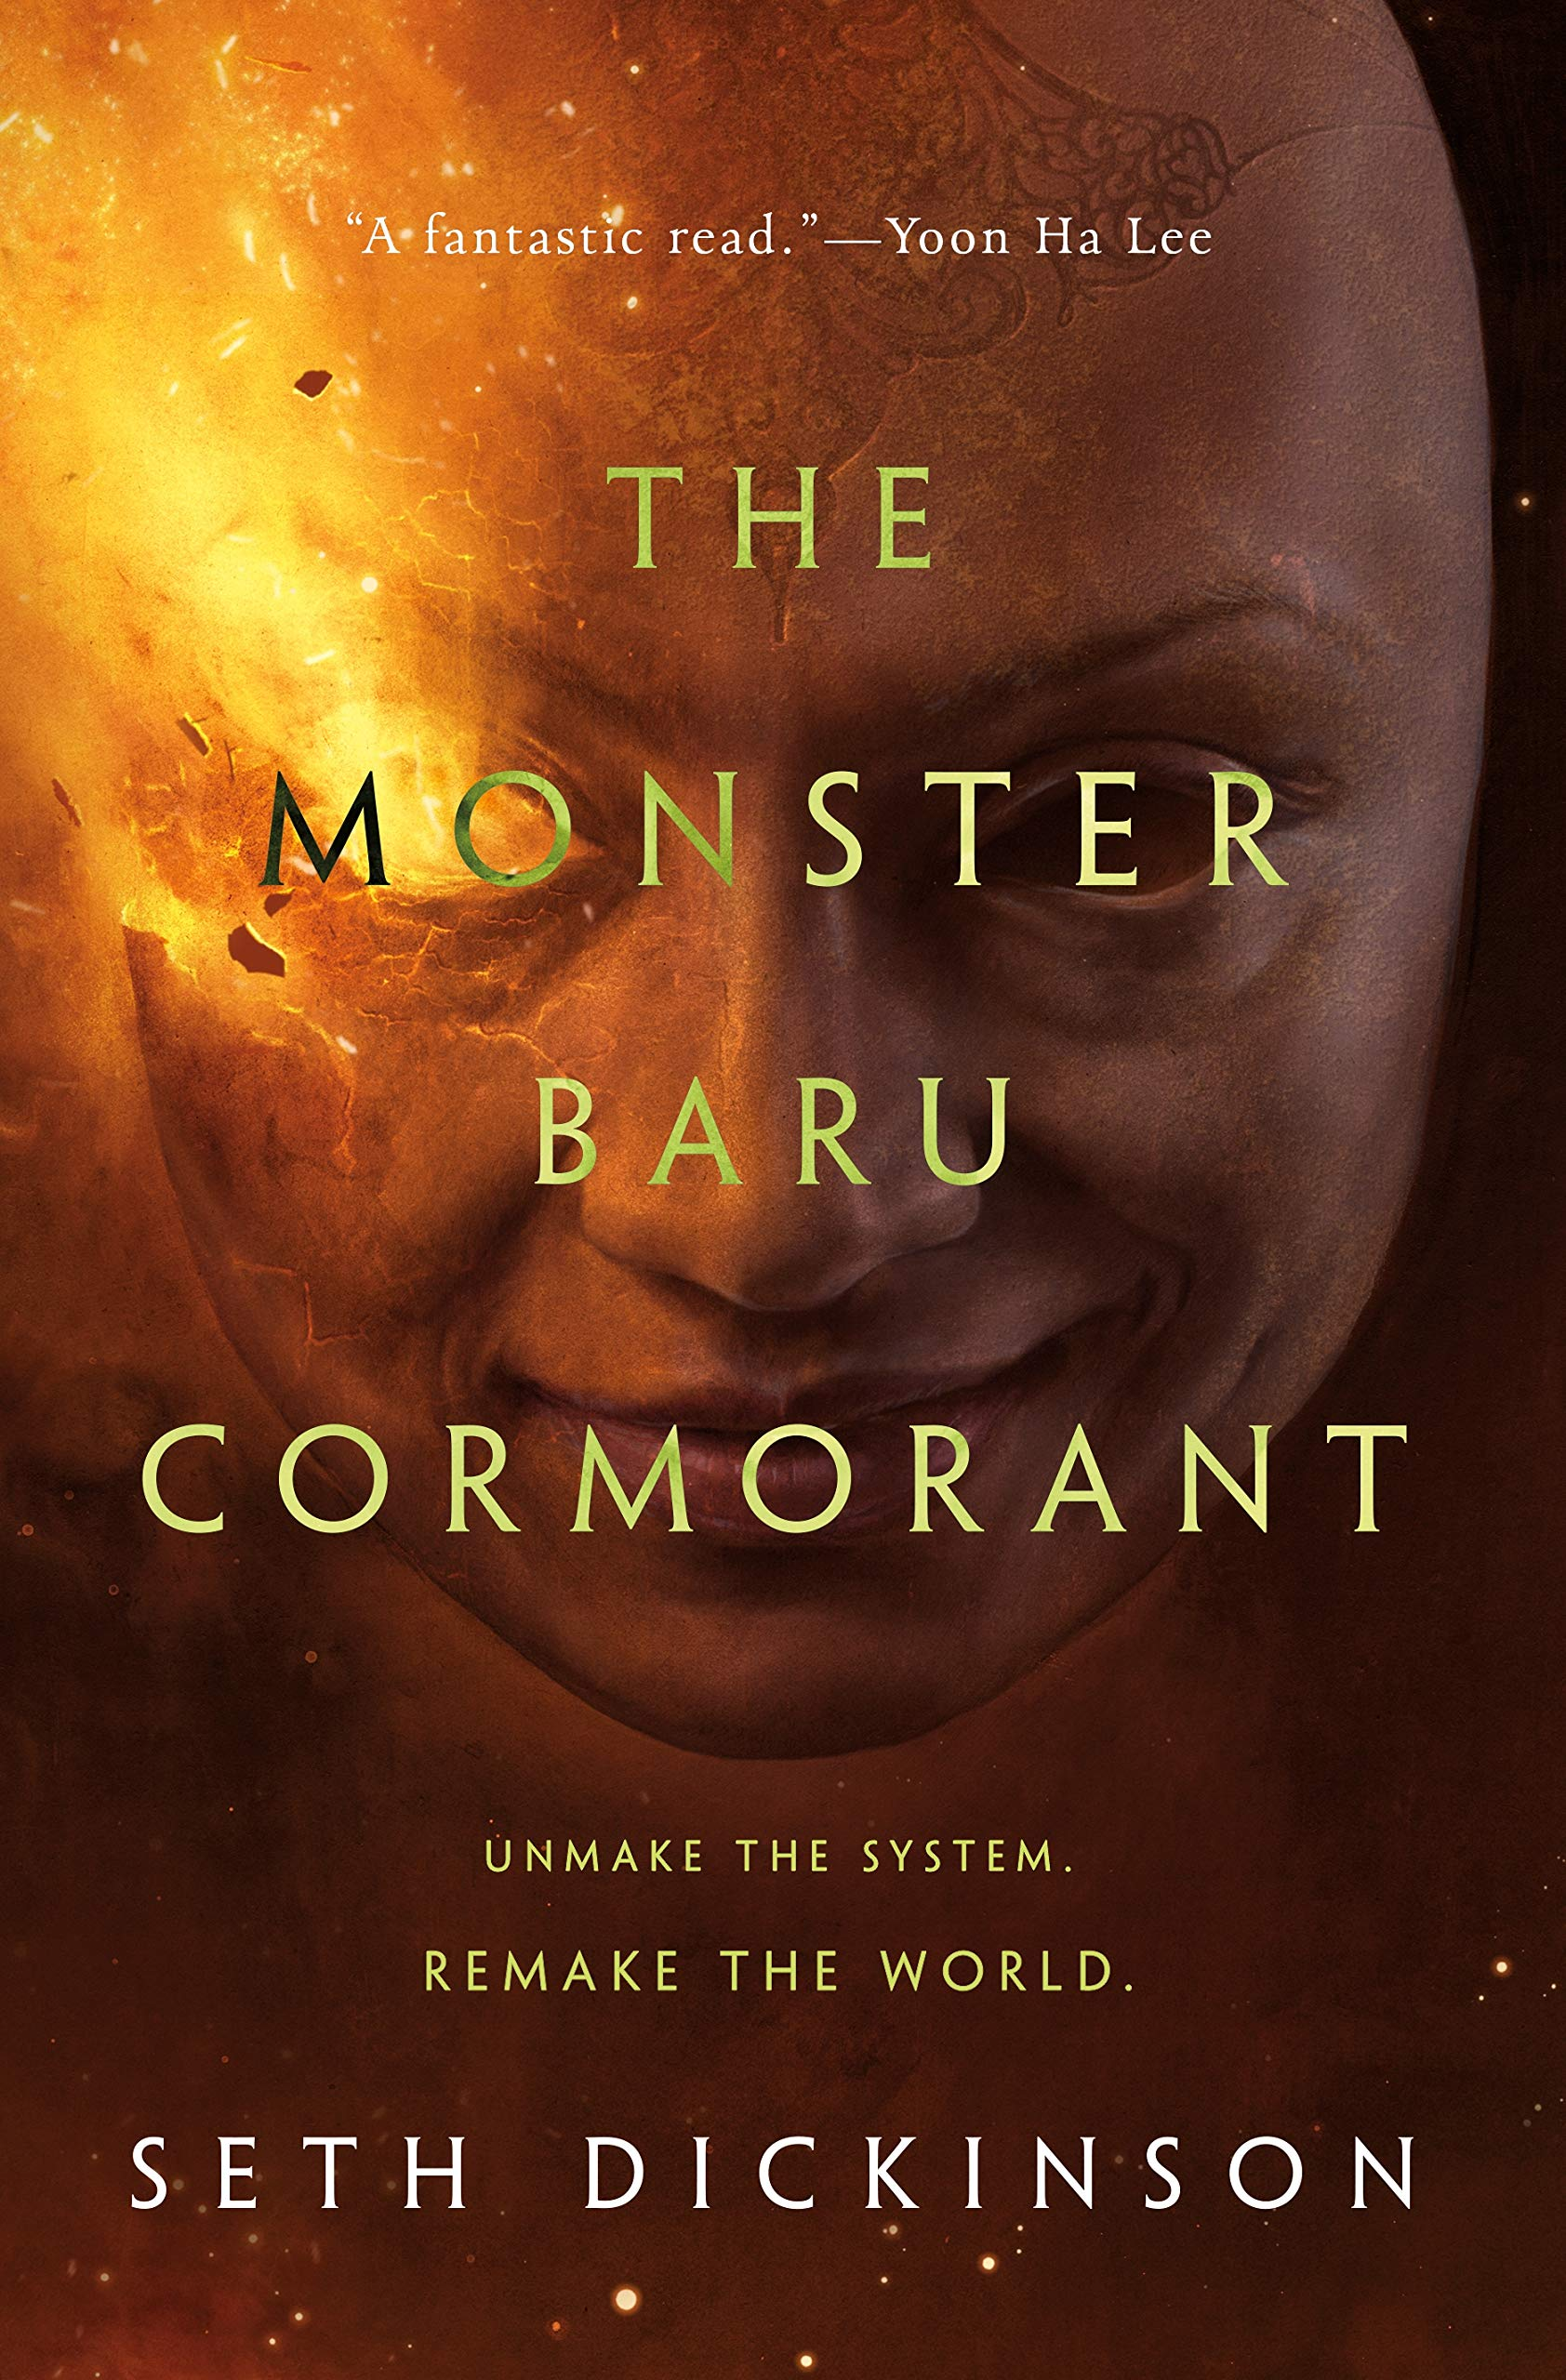 Amazon.fr - The Monster Baru Cormorant - Dickinson, Seth - Livres